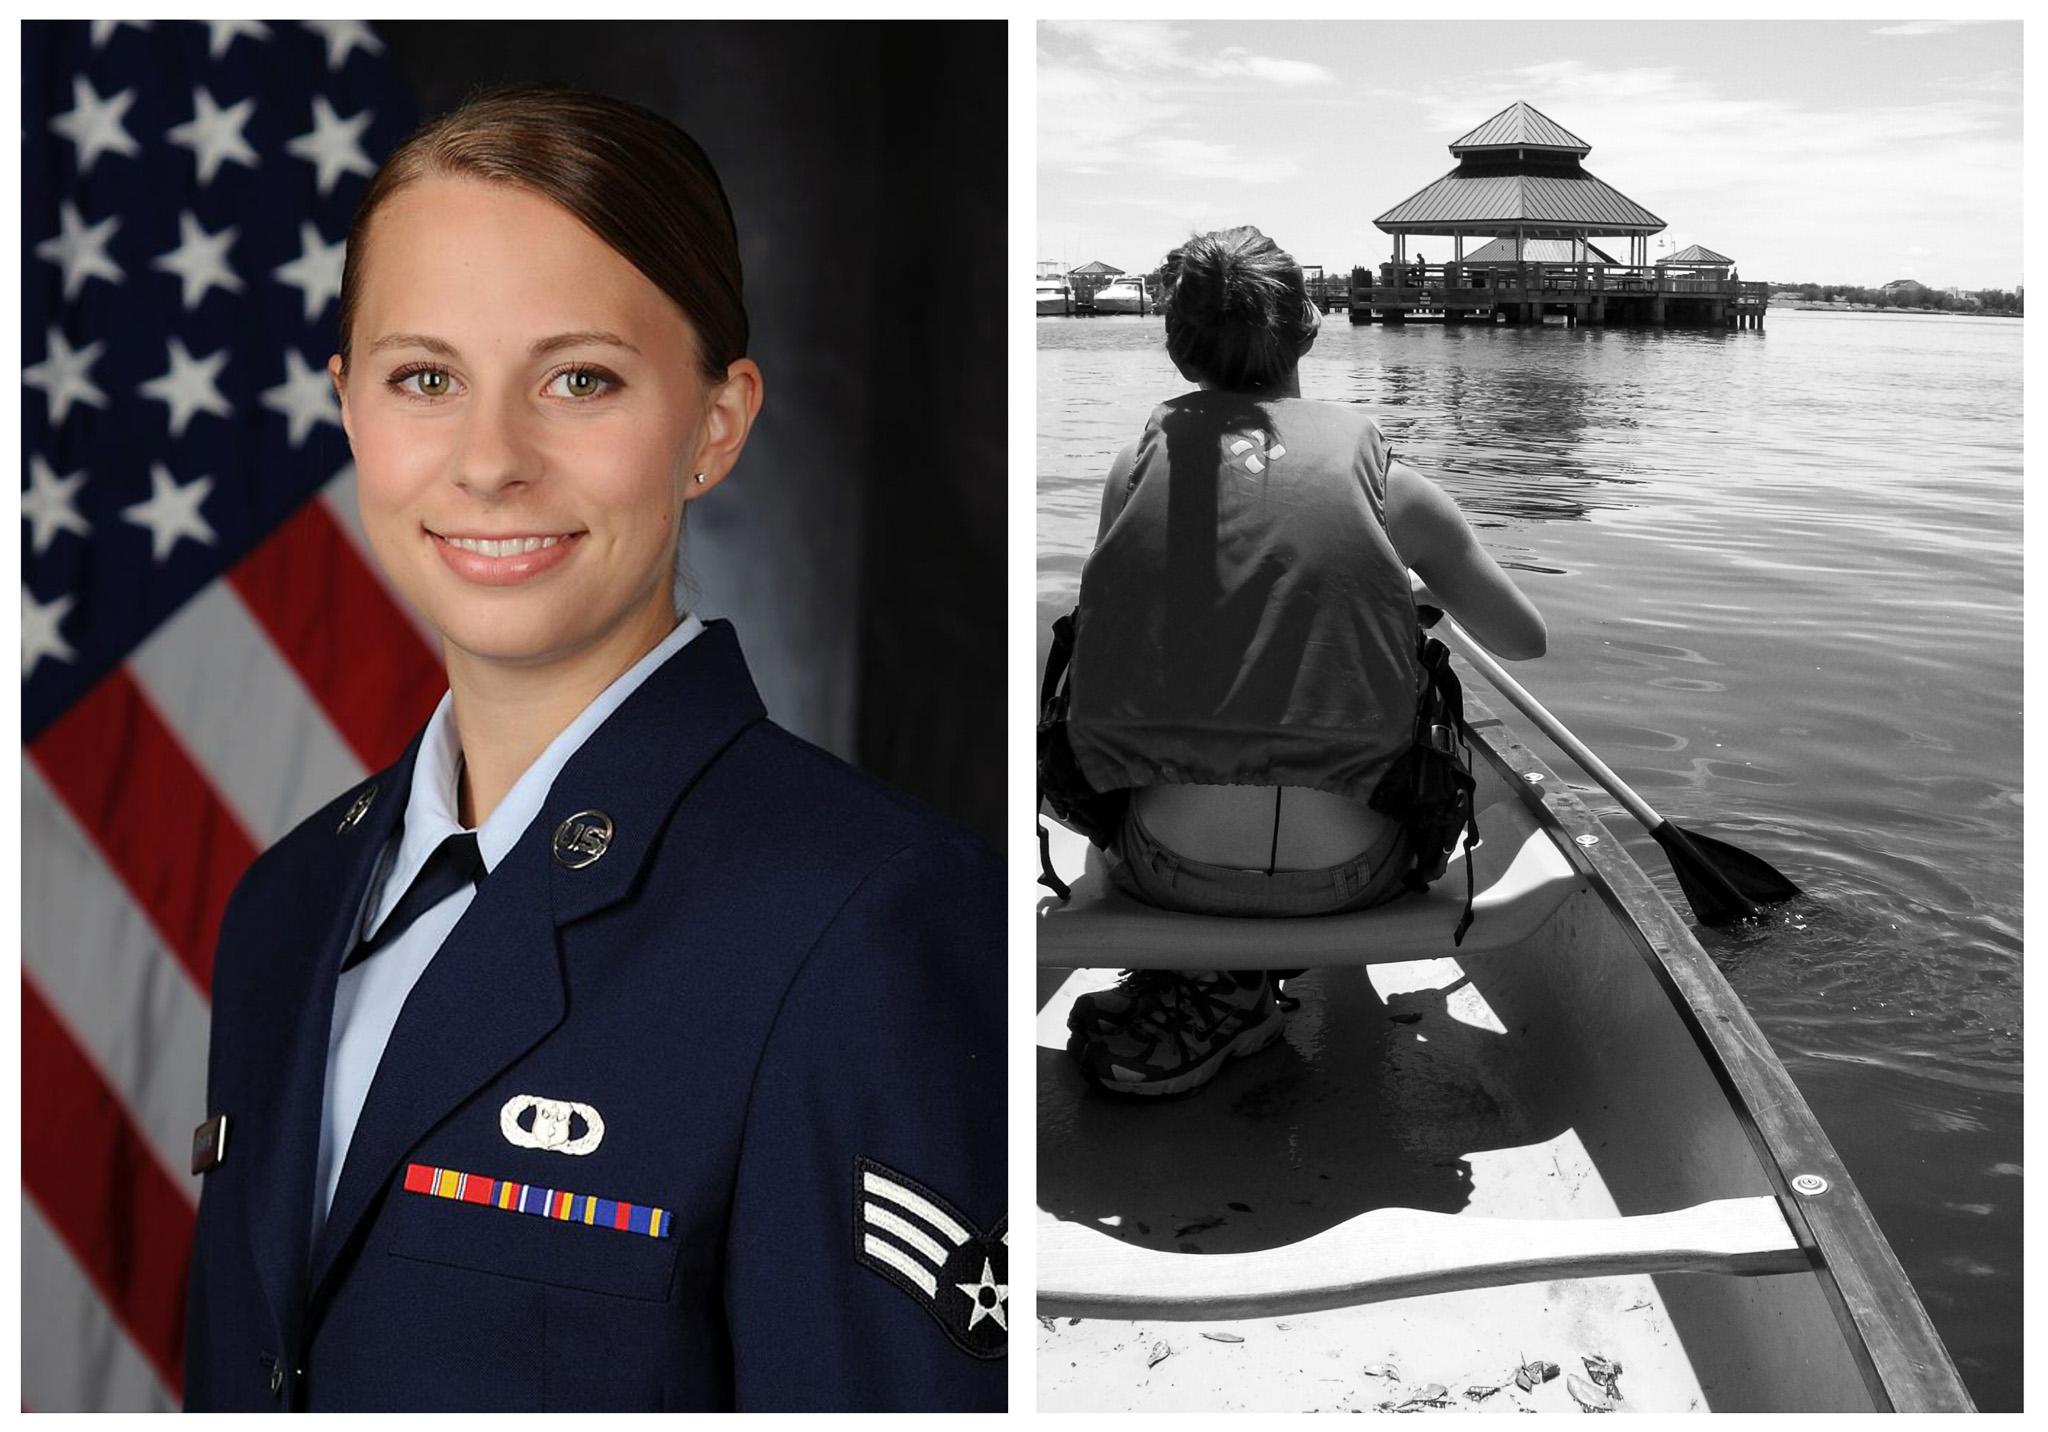 Left: Military portrait. Right: Keesler AFB, Mississippi